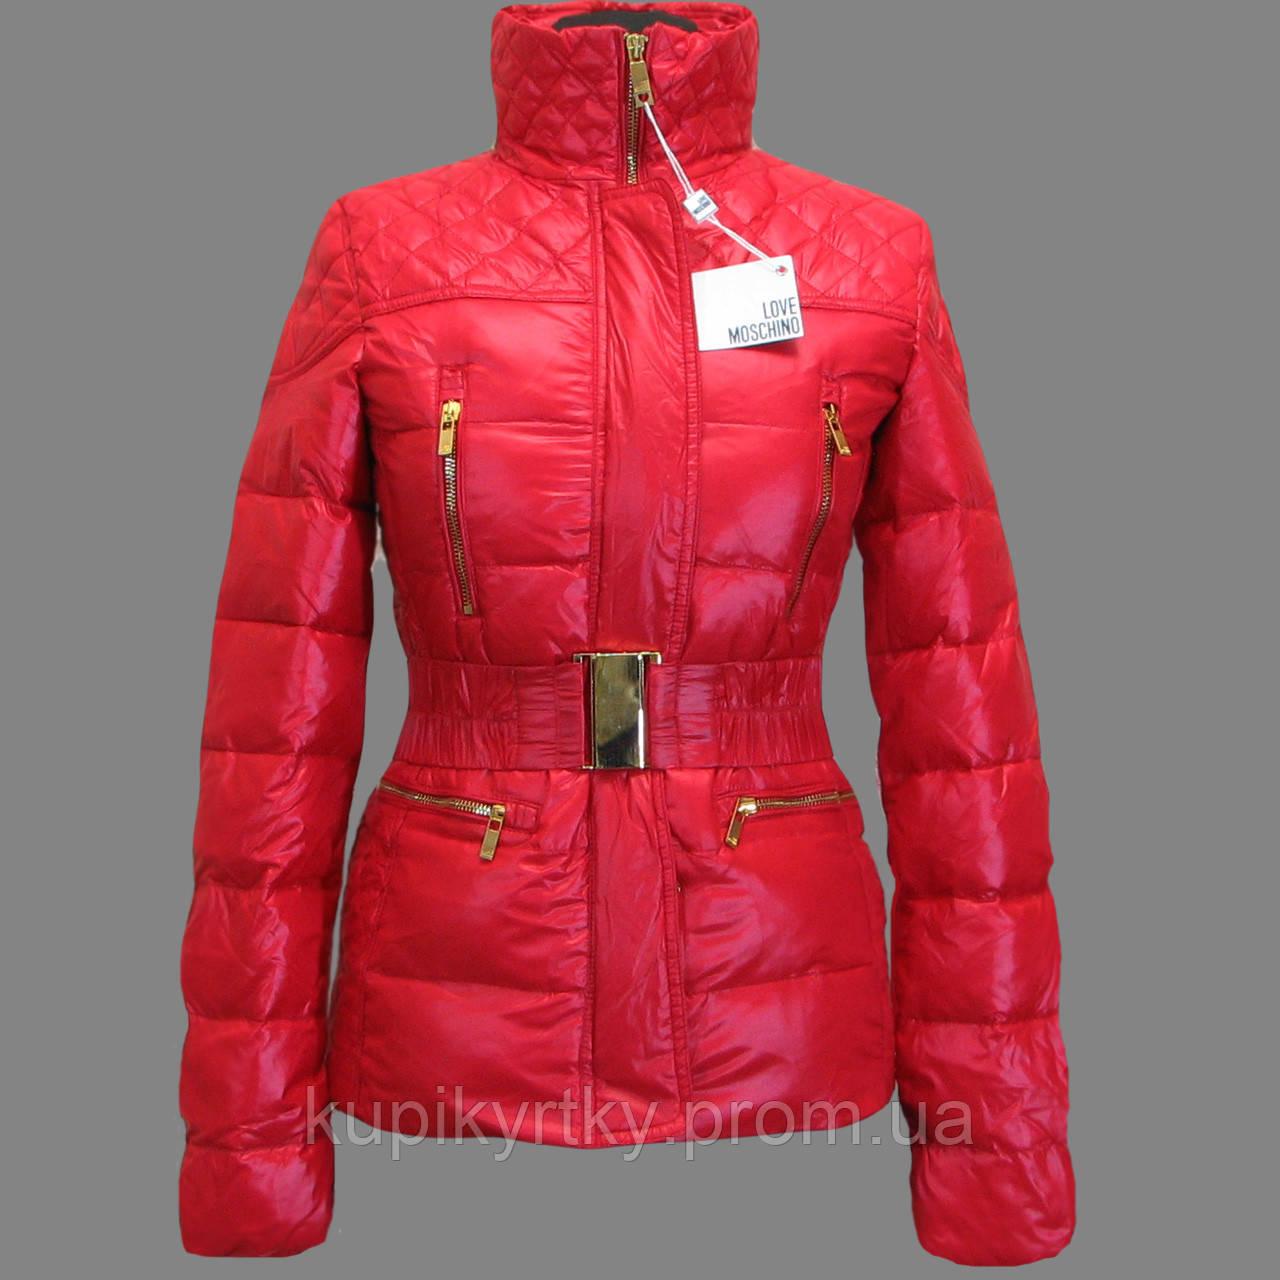 "Демисезонная куртка"" Love Moschino"""